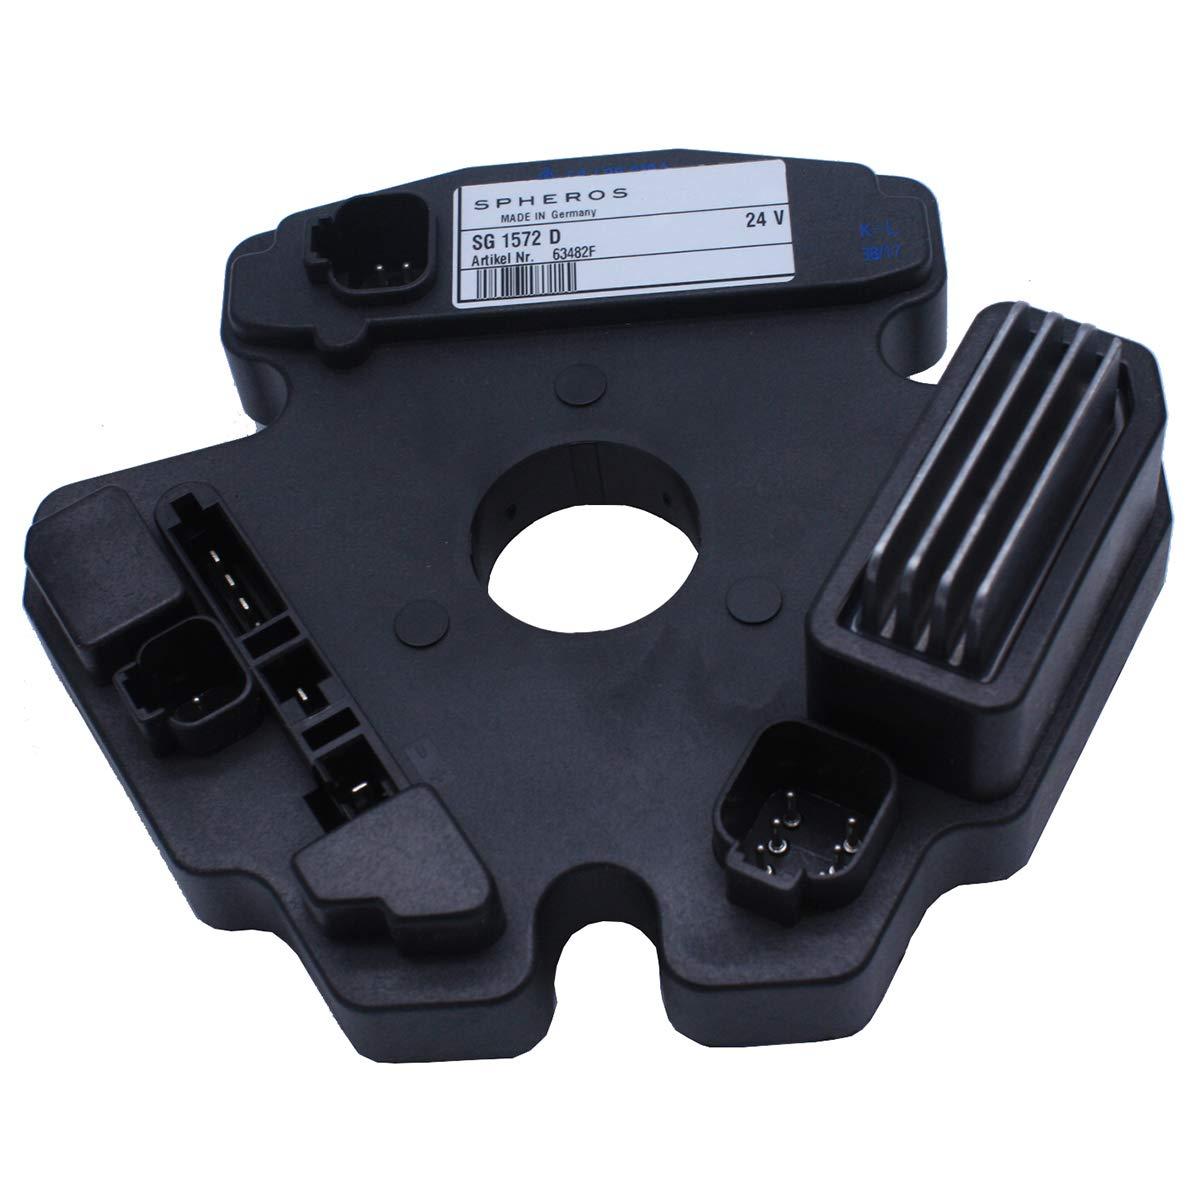 Spheros/Webasto Heater ECU SG1572 D fits Thermo 230 300 350 24V